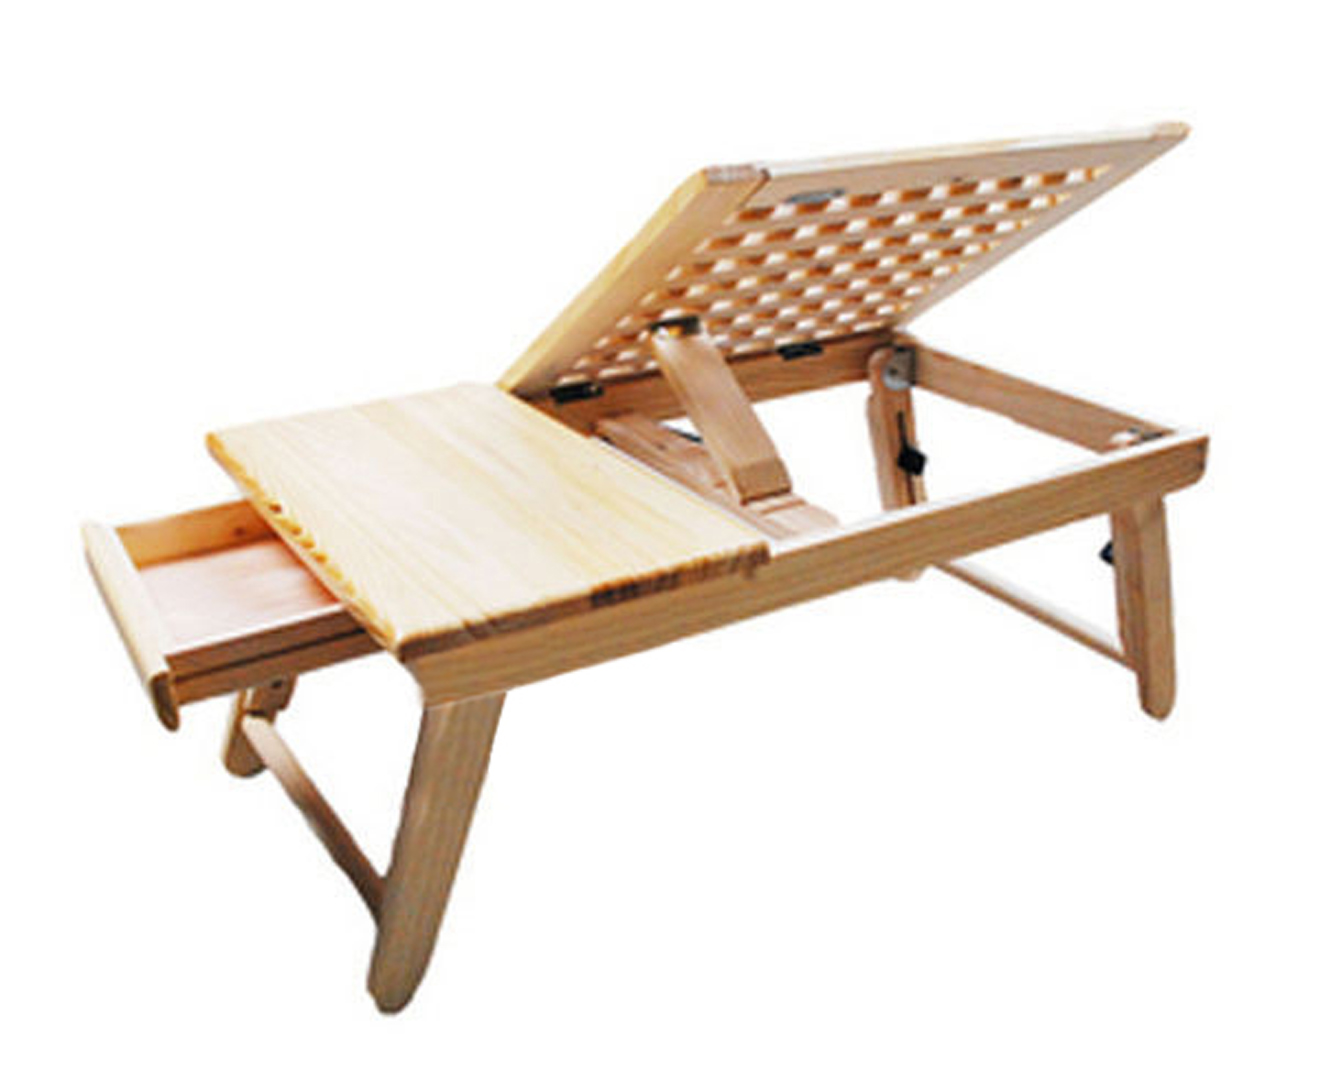 Adjustable portable notebook bed desk table wooden folding